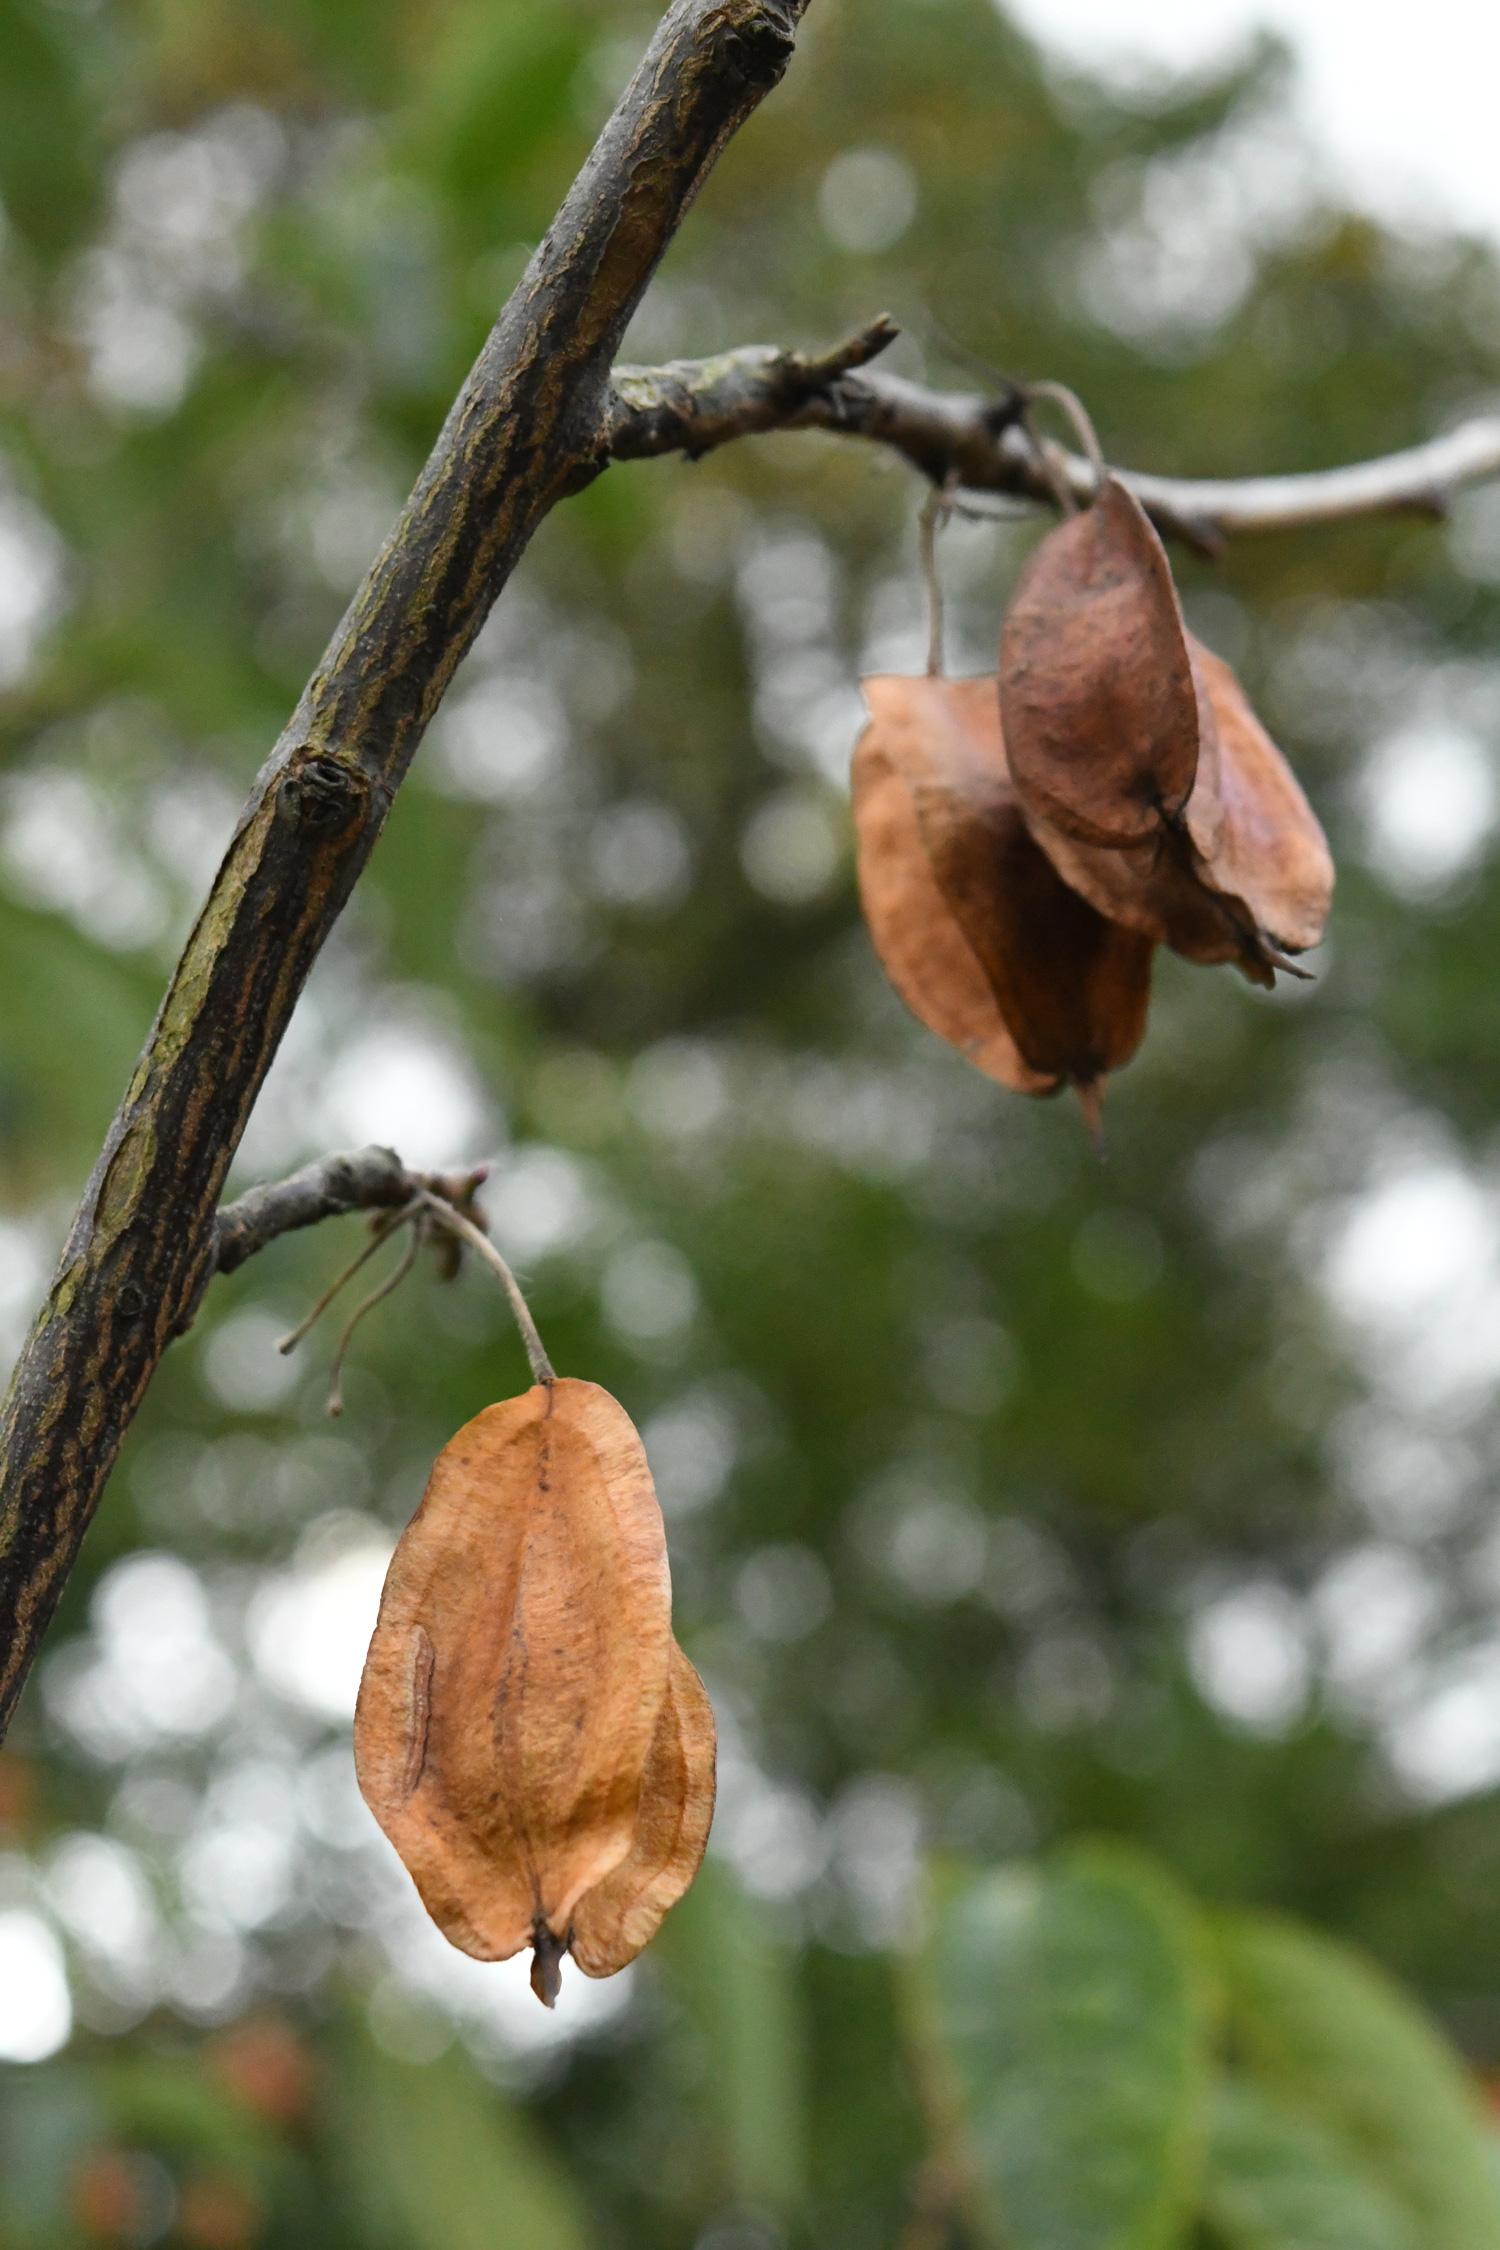 Unidentified tree fruit, Prospect Park